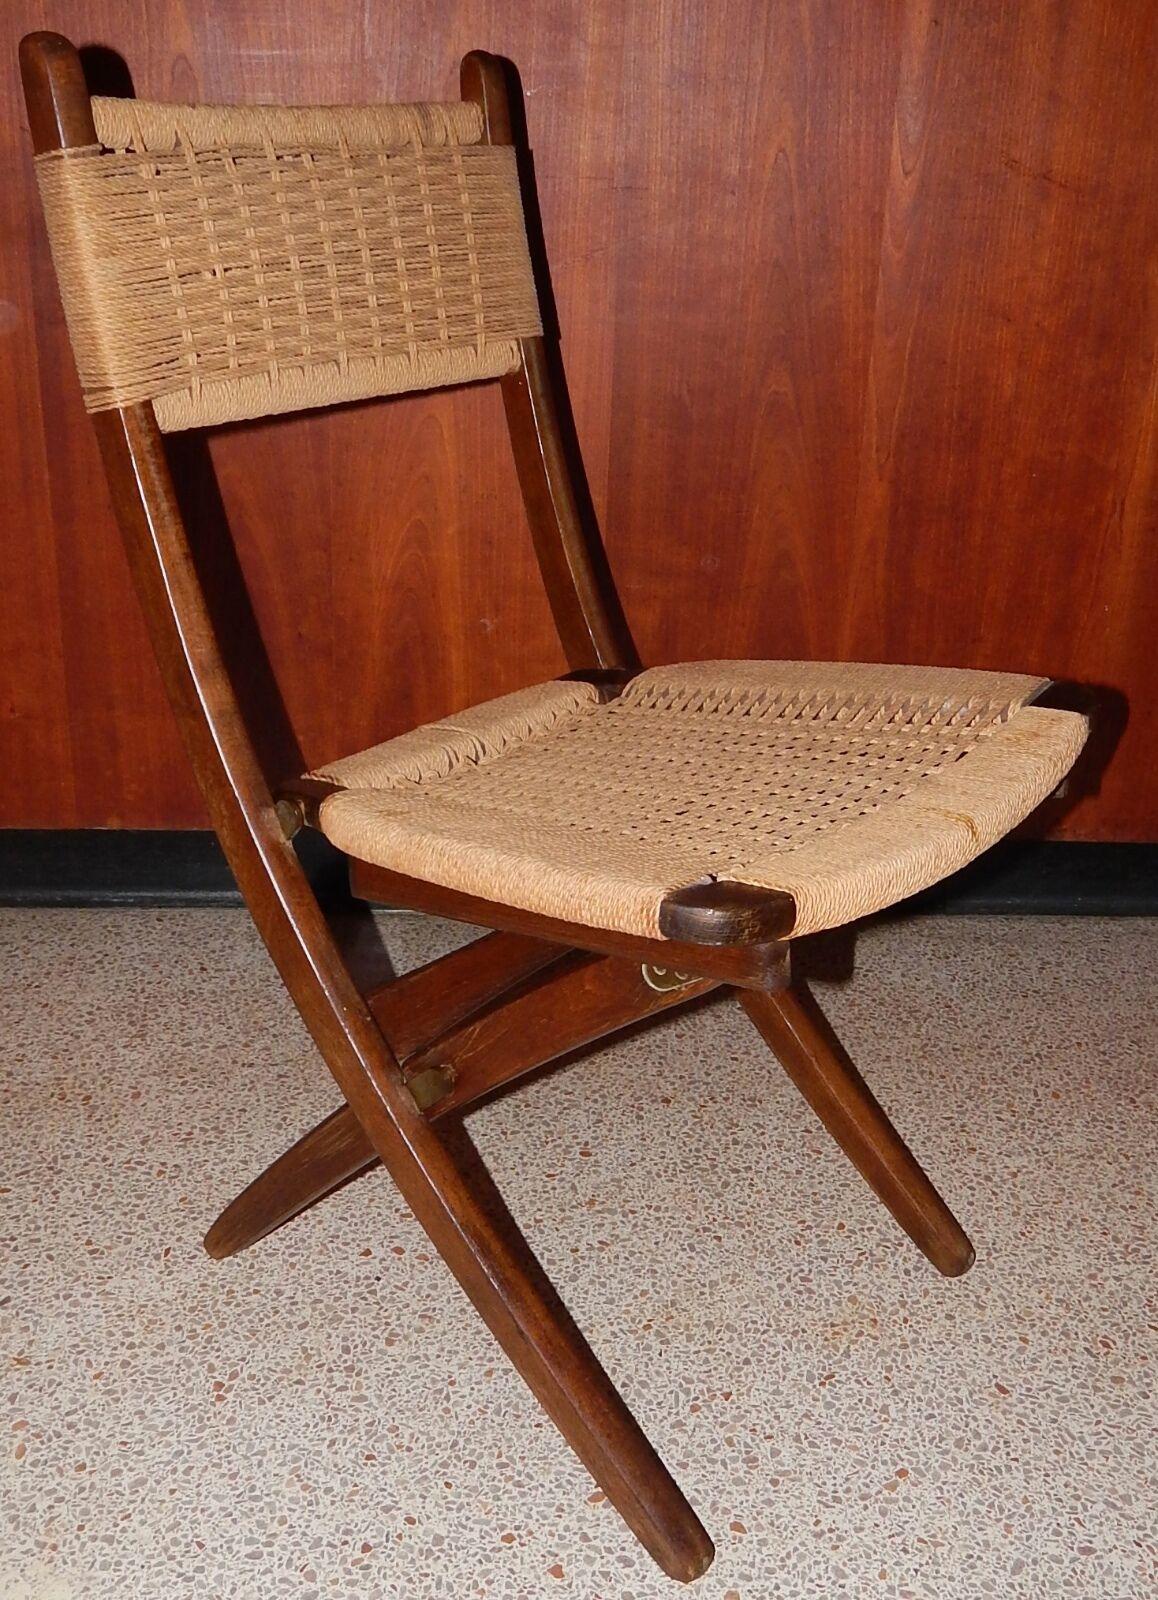 Vintage hans wegner folding chair something is